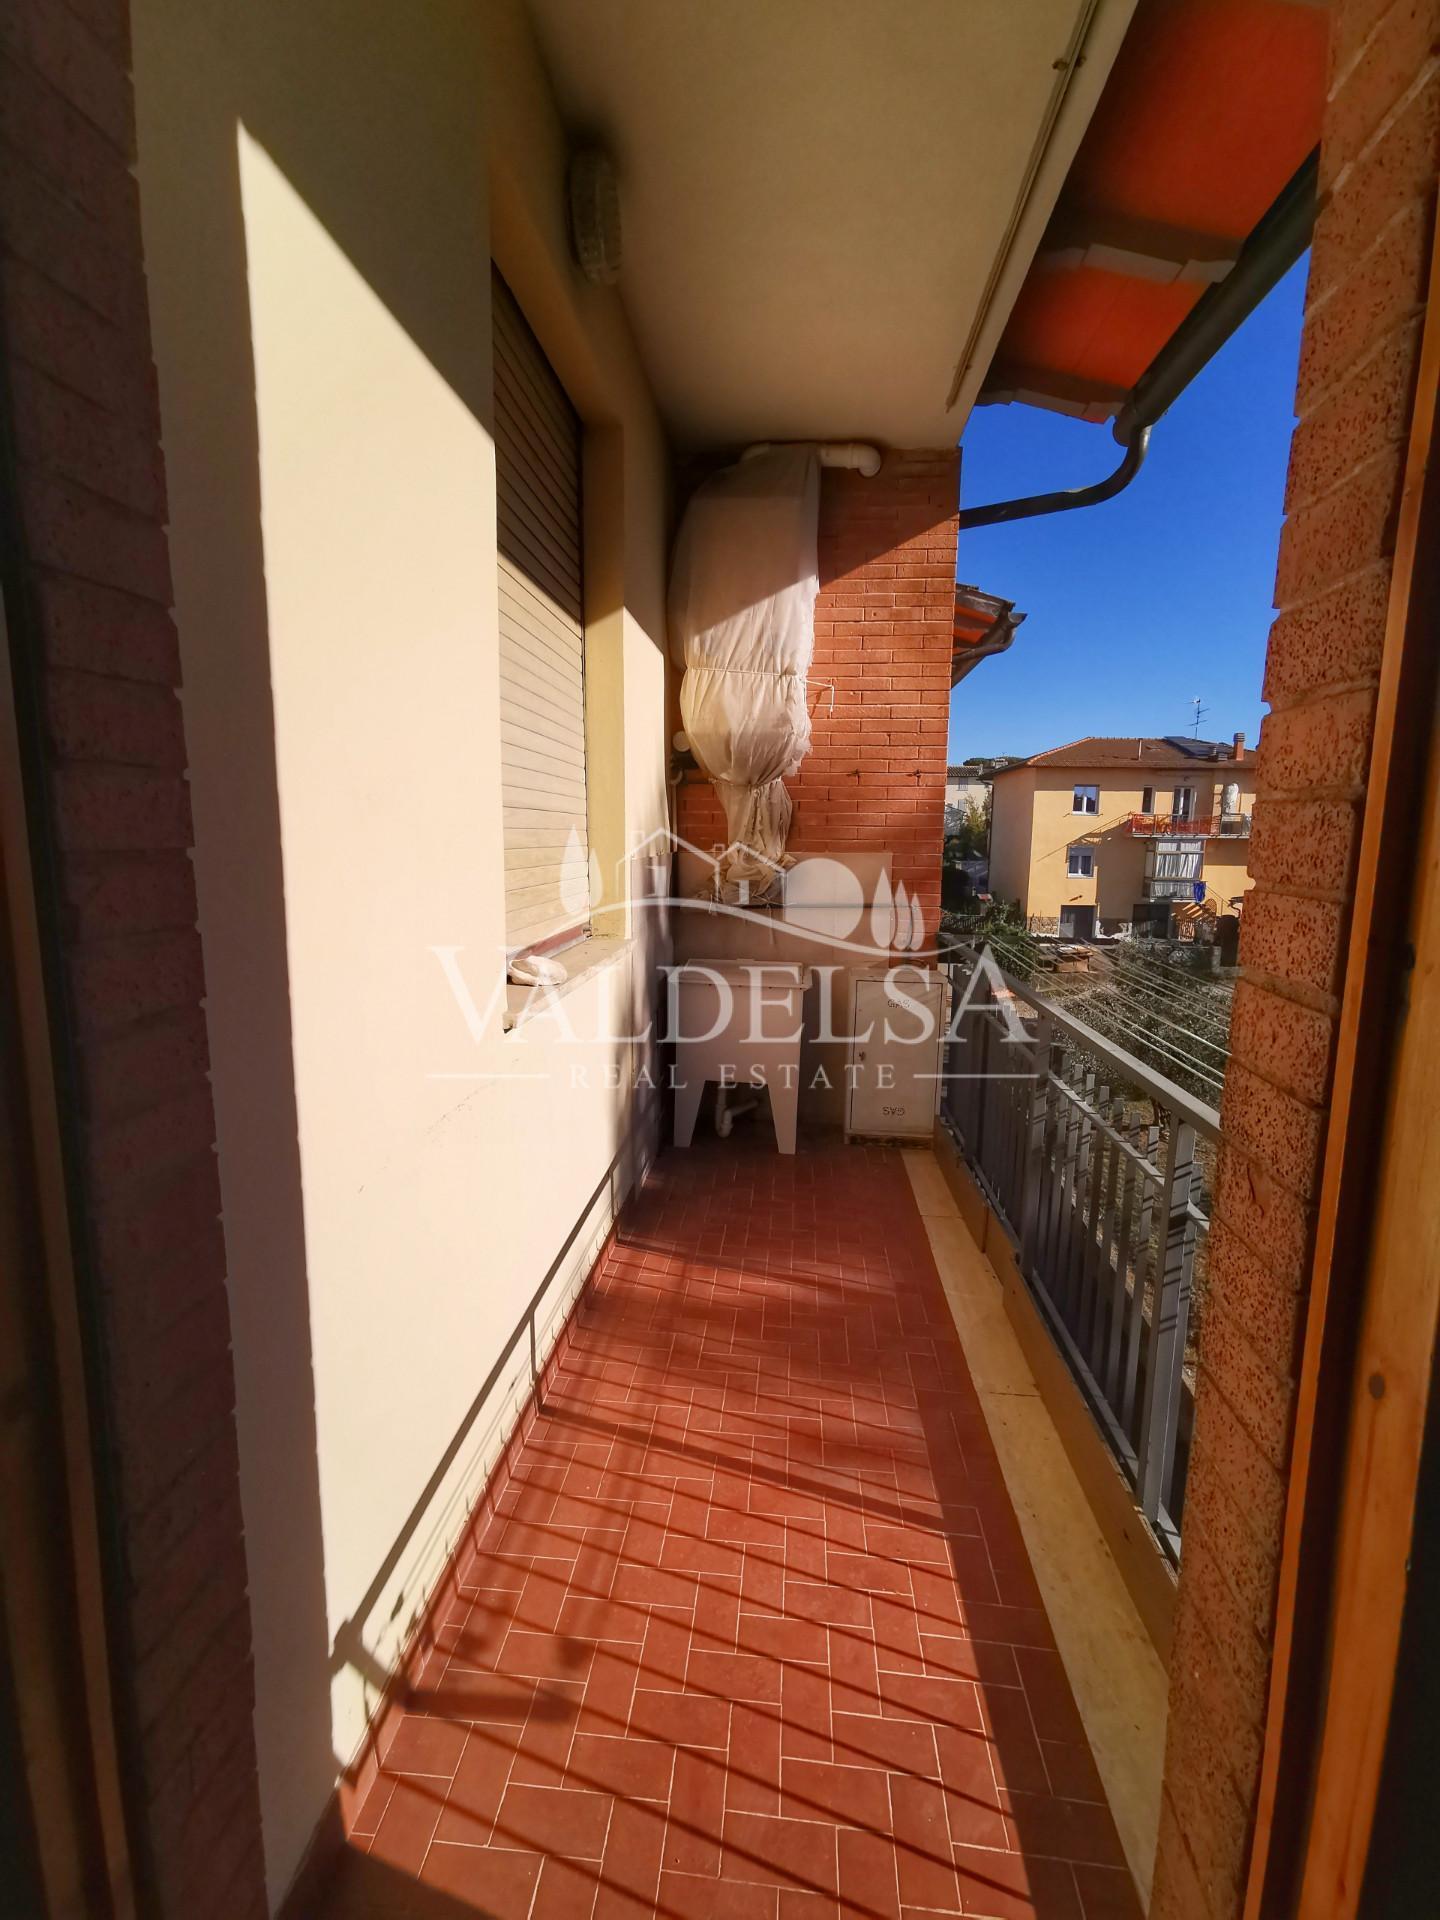 Apartment for rent in Tavarnelle Val di Pesa (FI)